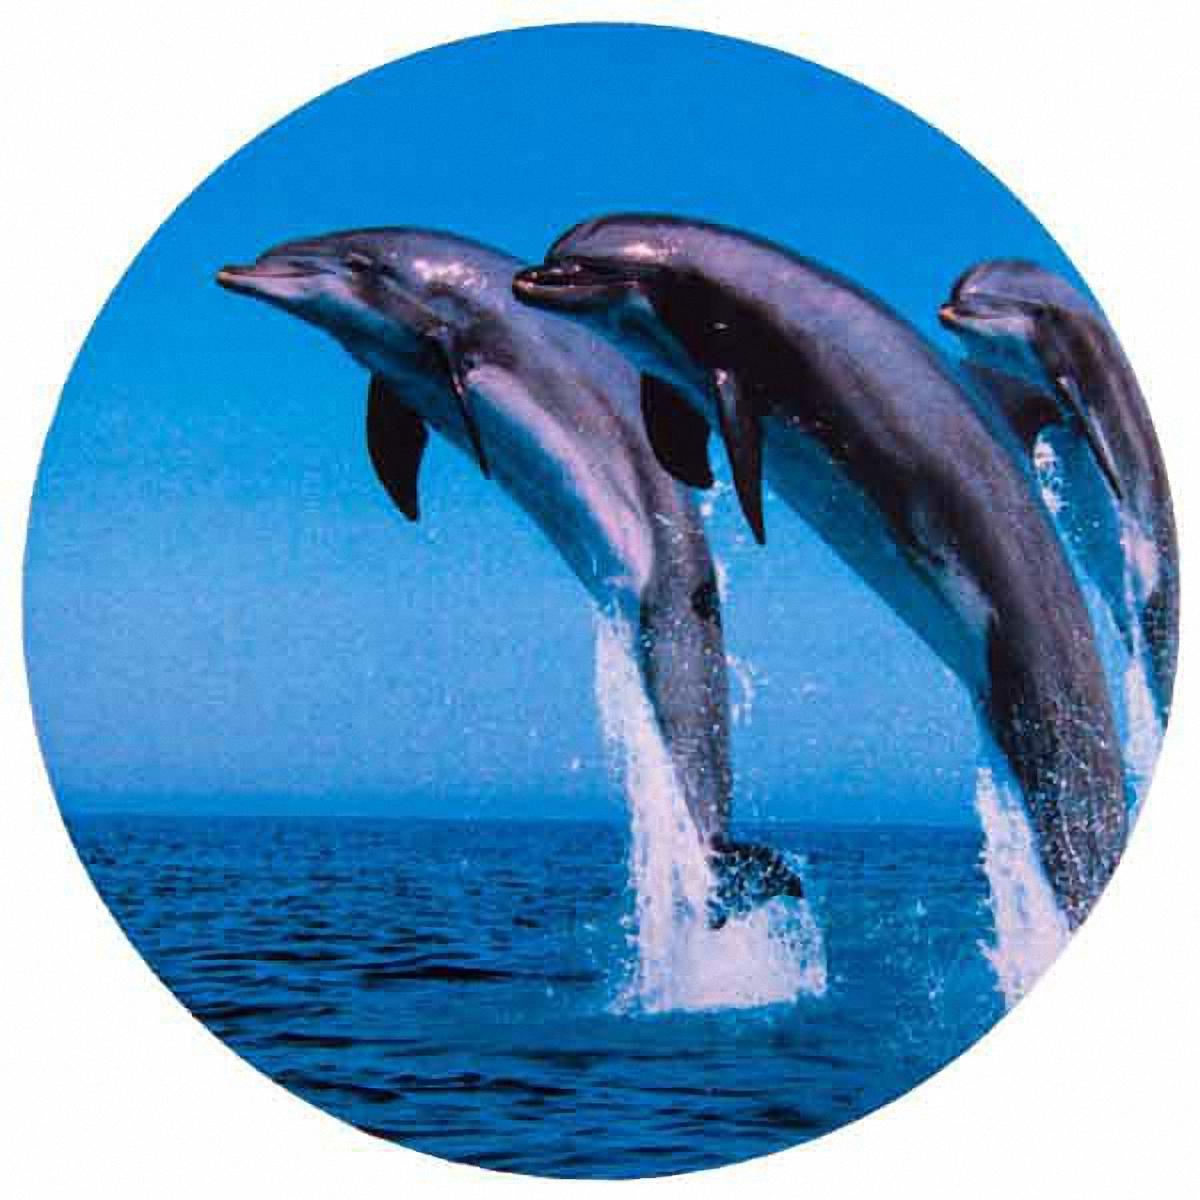 Чехол на запасное колесо Skyway, цвет: синий чехол skyway s06301007